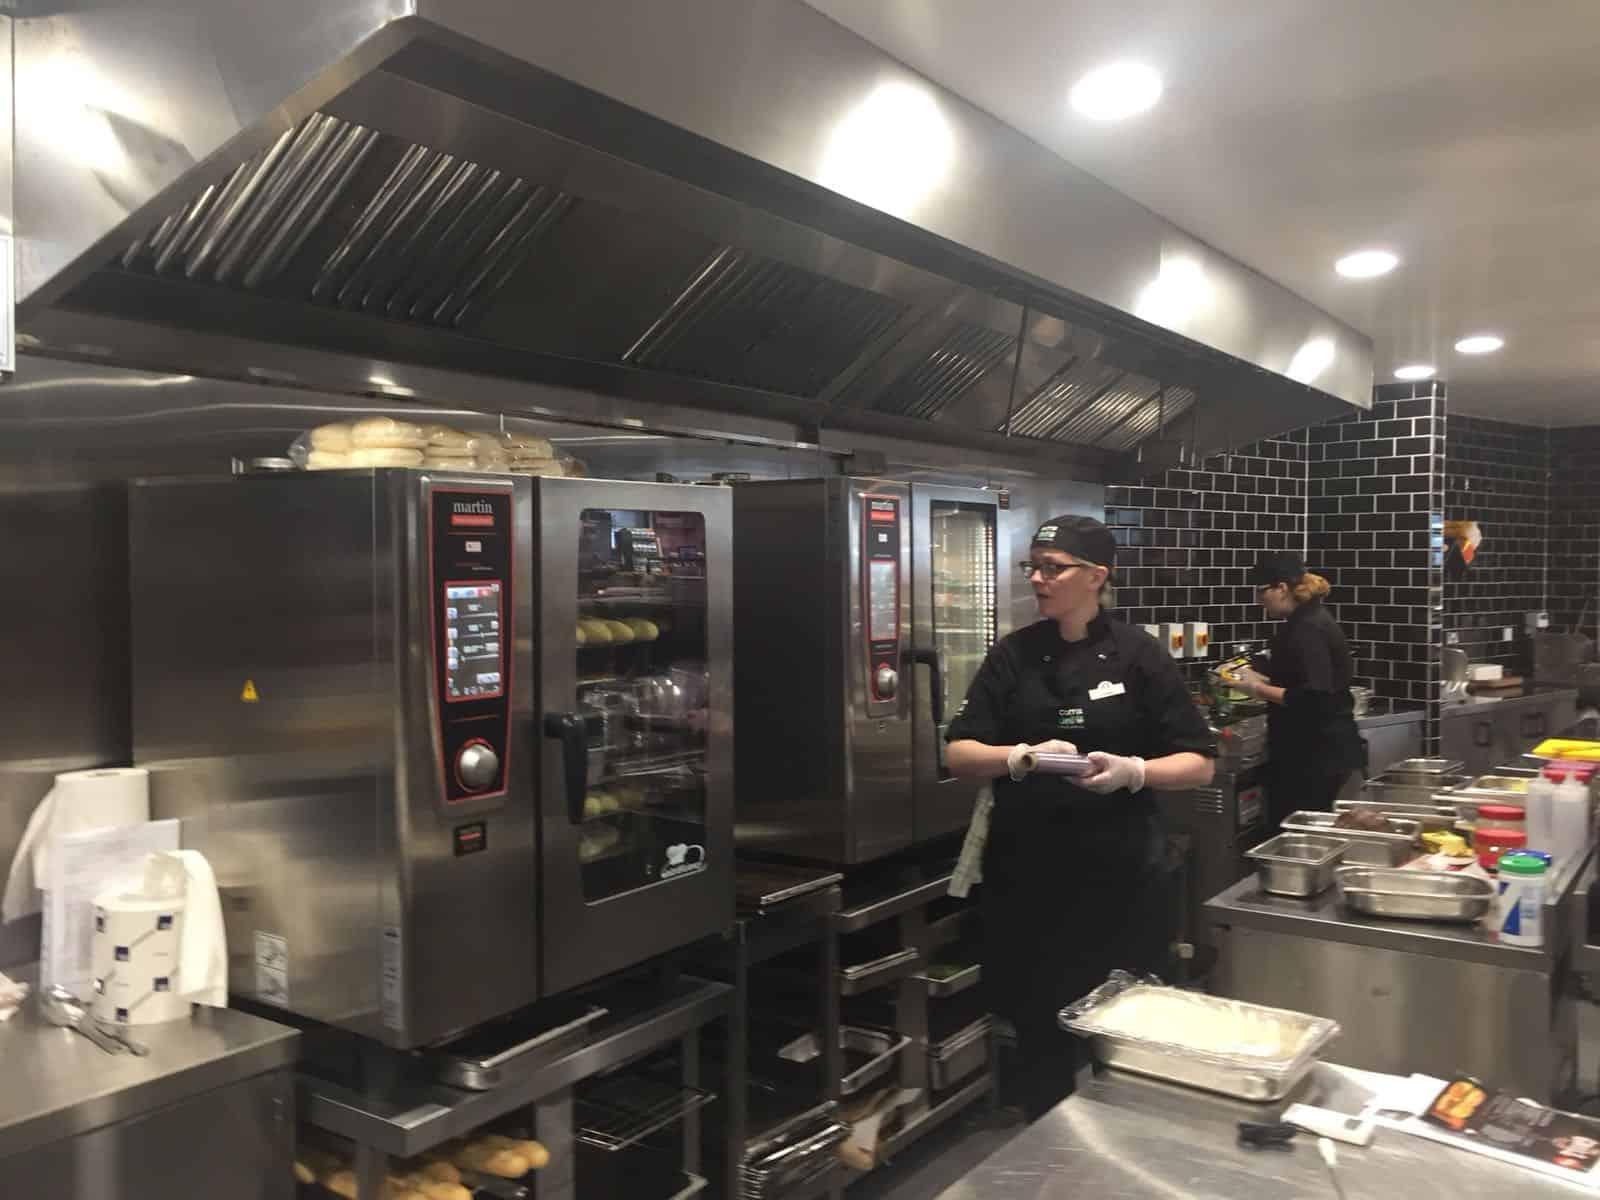 Martin Food Equipment IMG-20180216-WA0004 Corrib Oil, Roscommon Installations